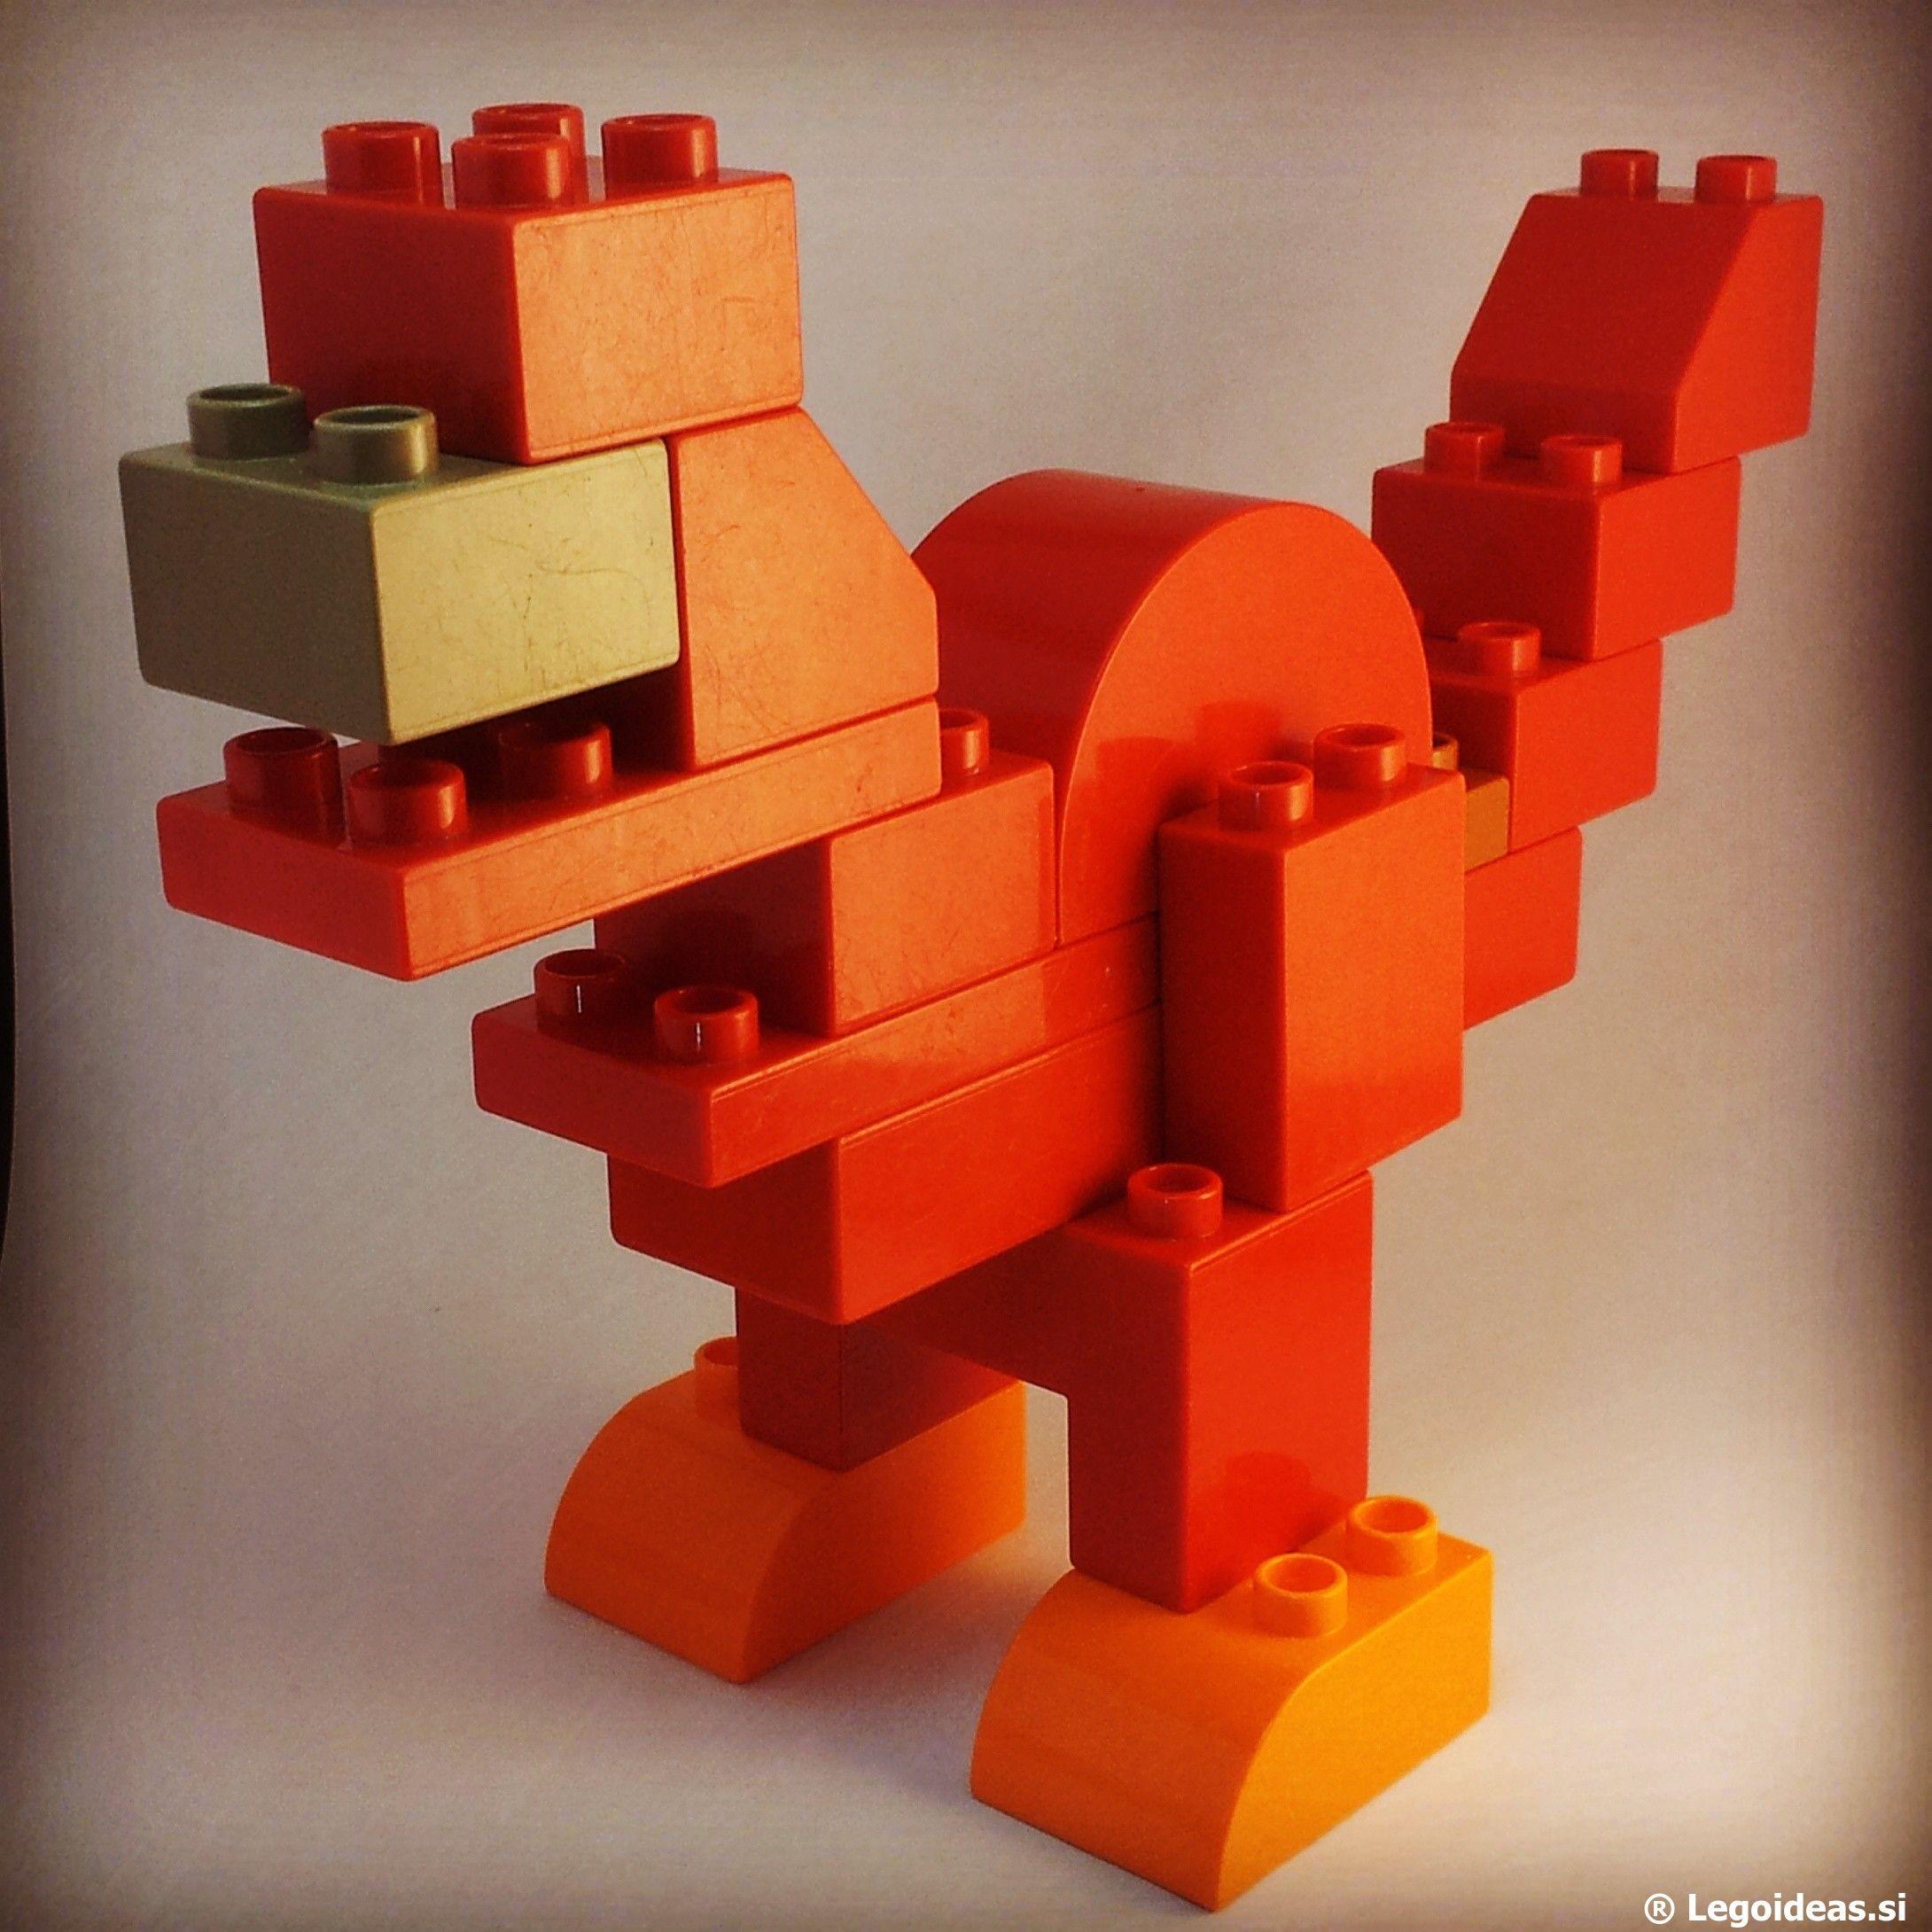 Lego duplo dinosaur lego duplo tyrannosaurus rex duplo pinterest dinosaure lego und enfant - Jeux lego dino ...